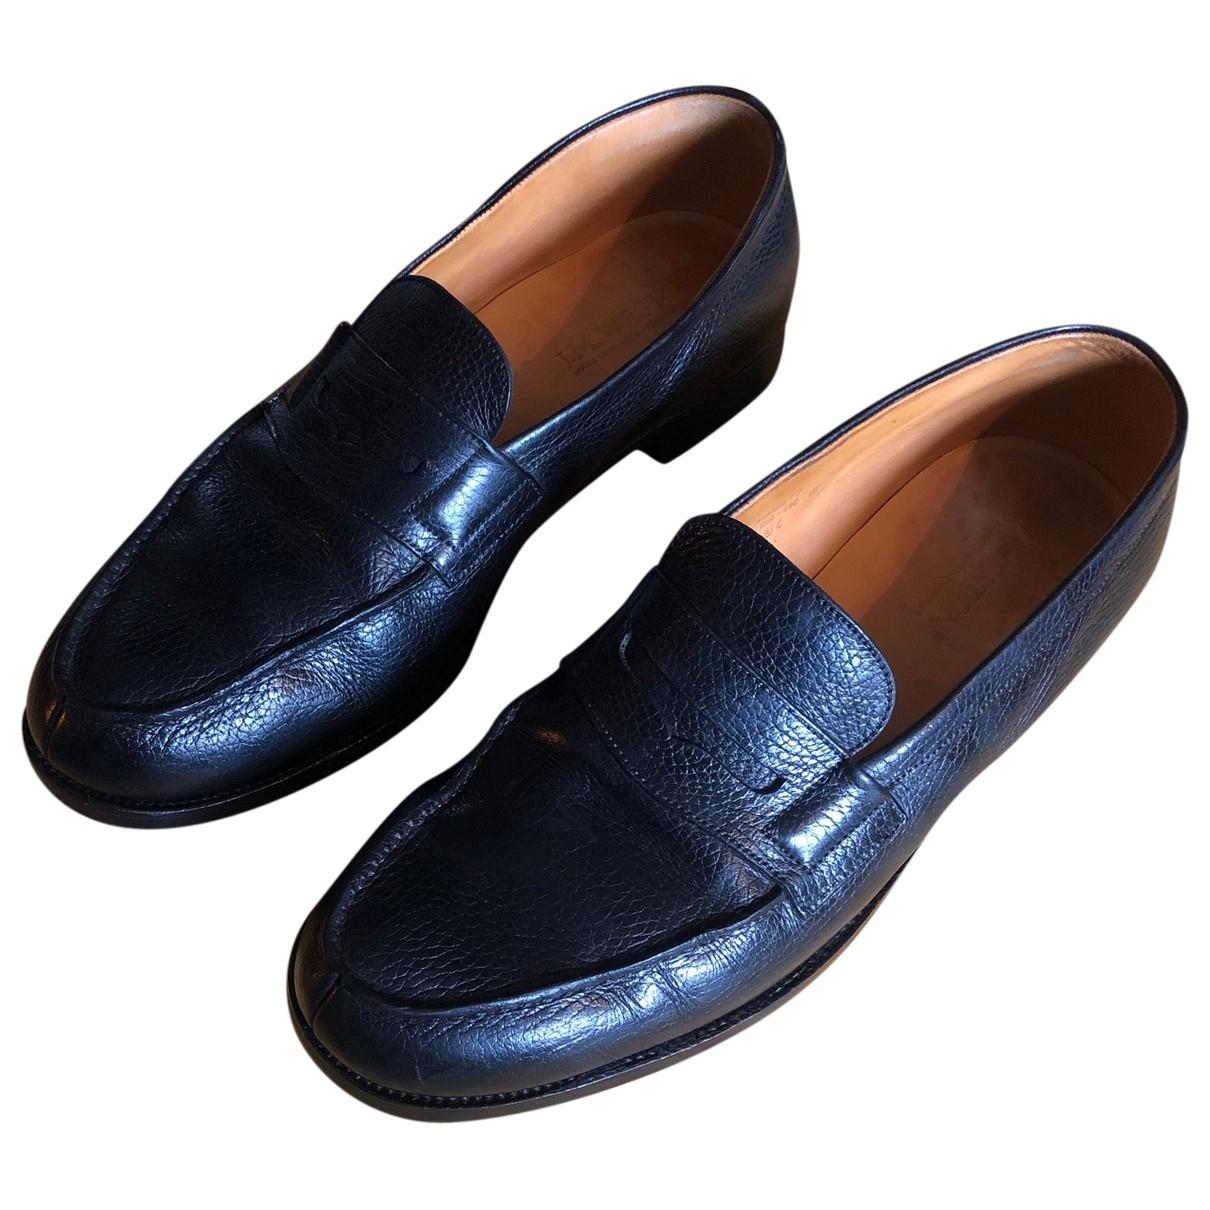 Jm Weston \N Black Leather Flats for Men 42 EU